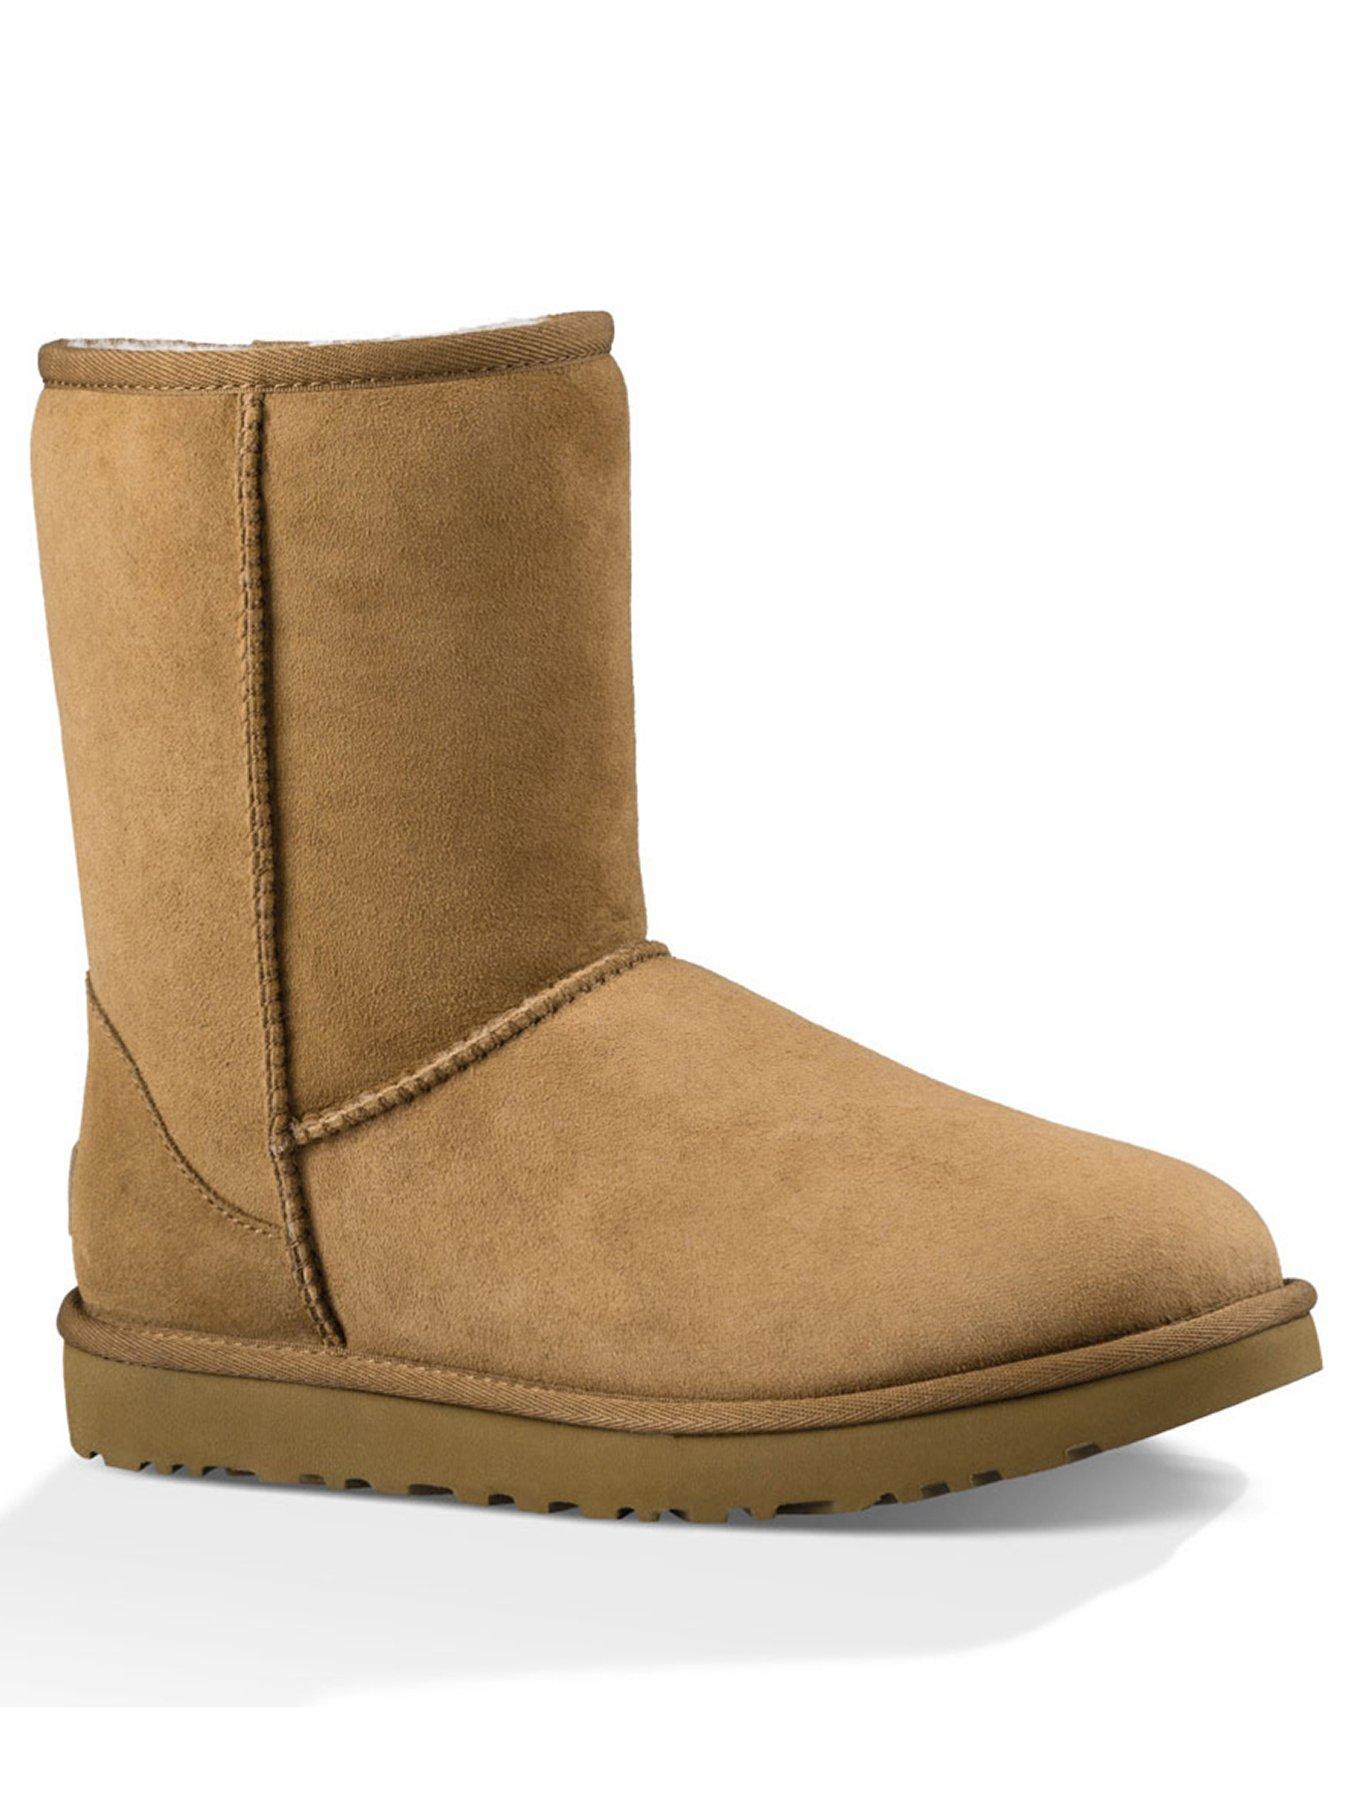 best deals on ugg boots uk